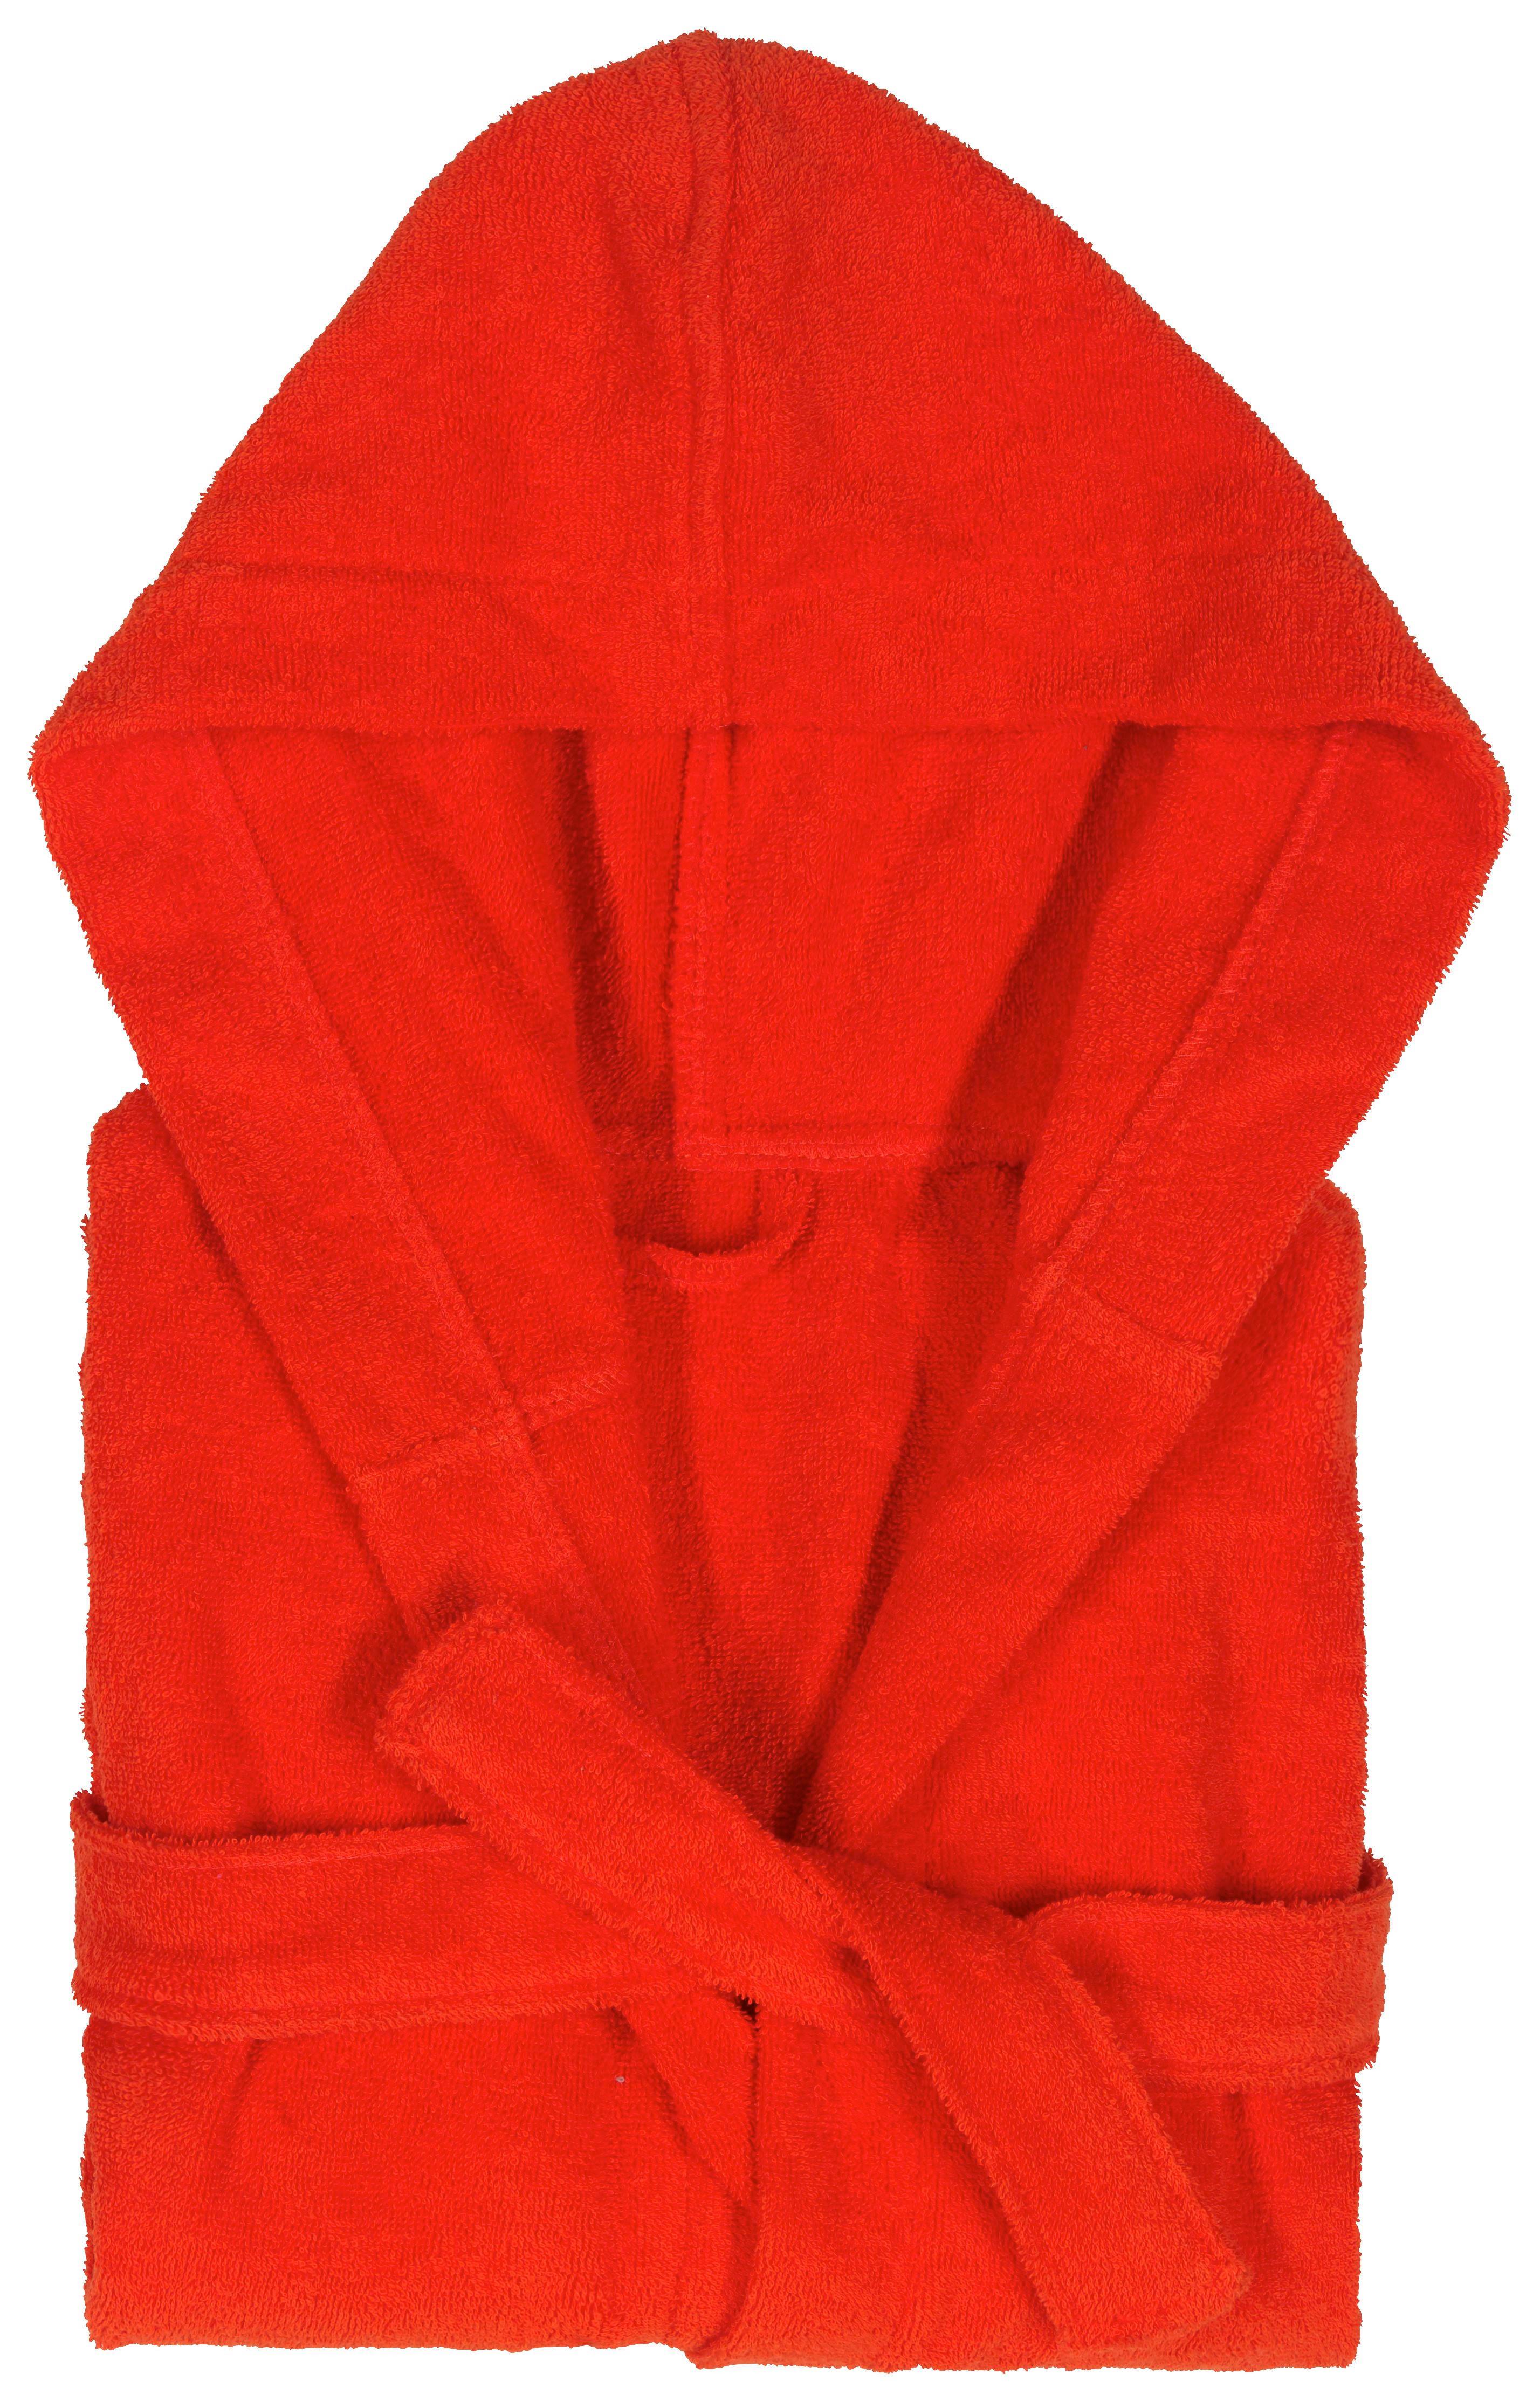 BADROCK FÖR BARN - orange, Basics, textil (134/140) - Esposa